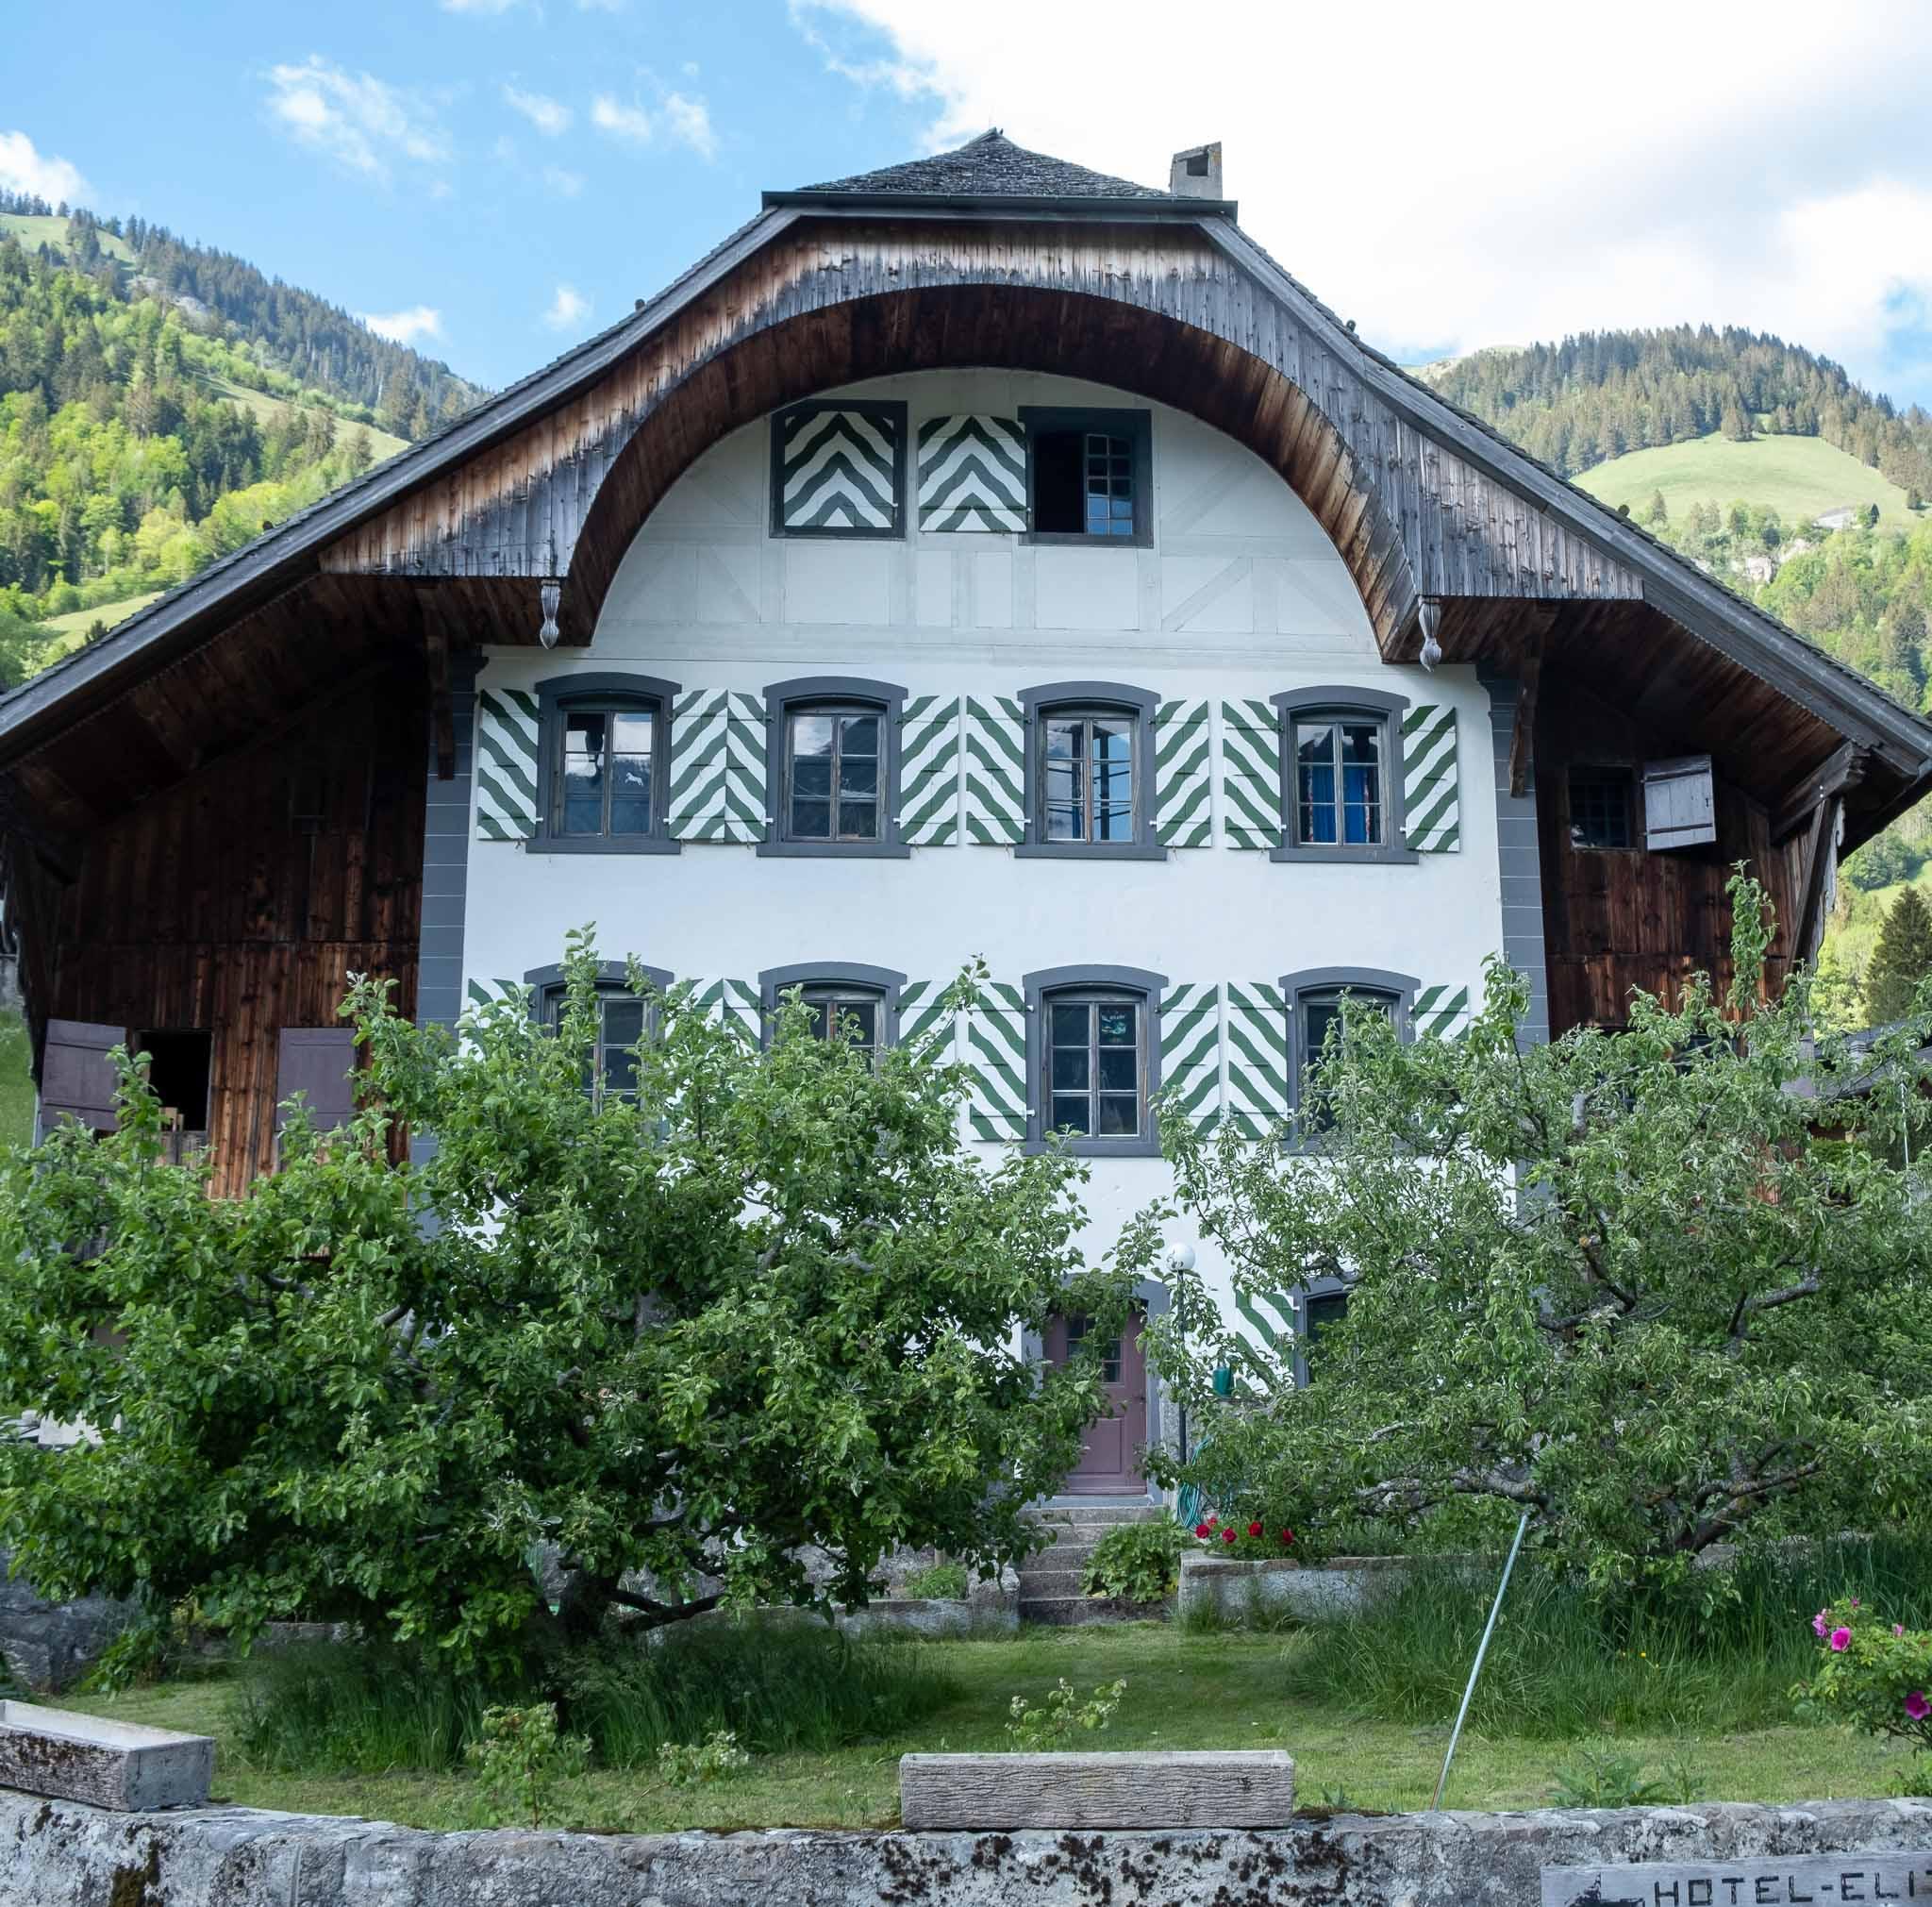 Minister's House on Rossinière audio tour Cowbells, Chalets and Balthus: A Swiss Alpine Village Excursion